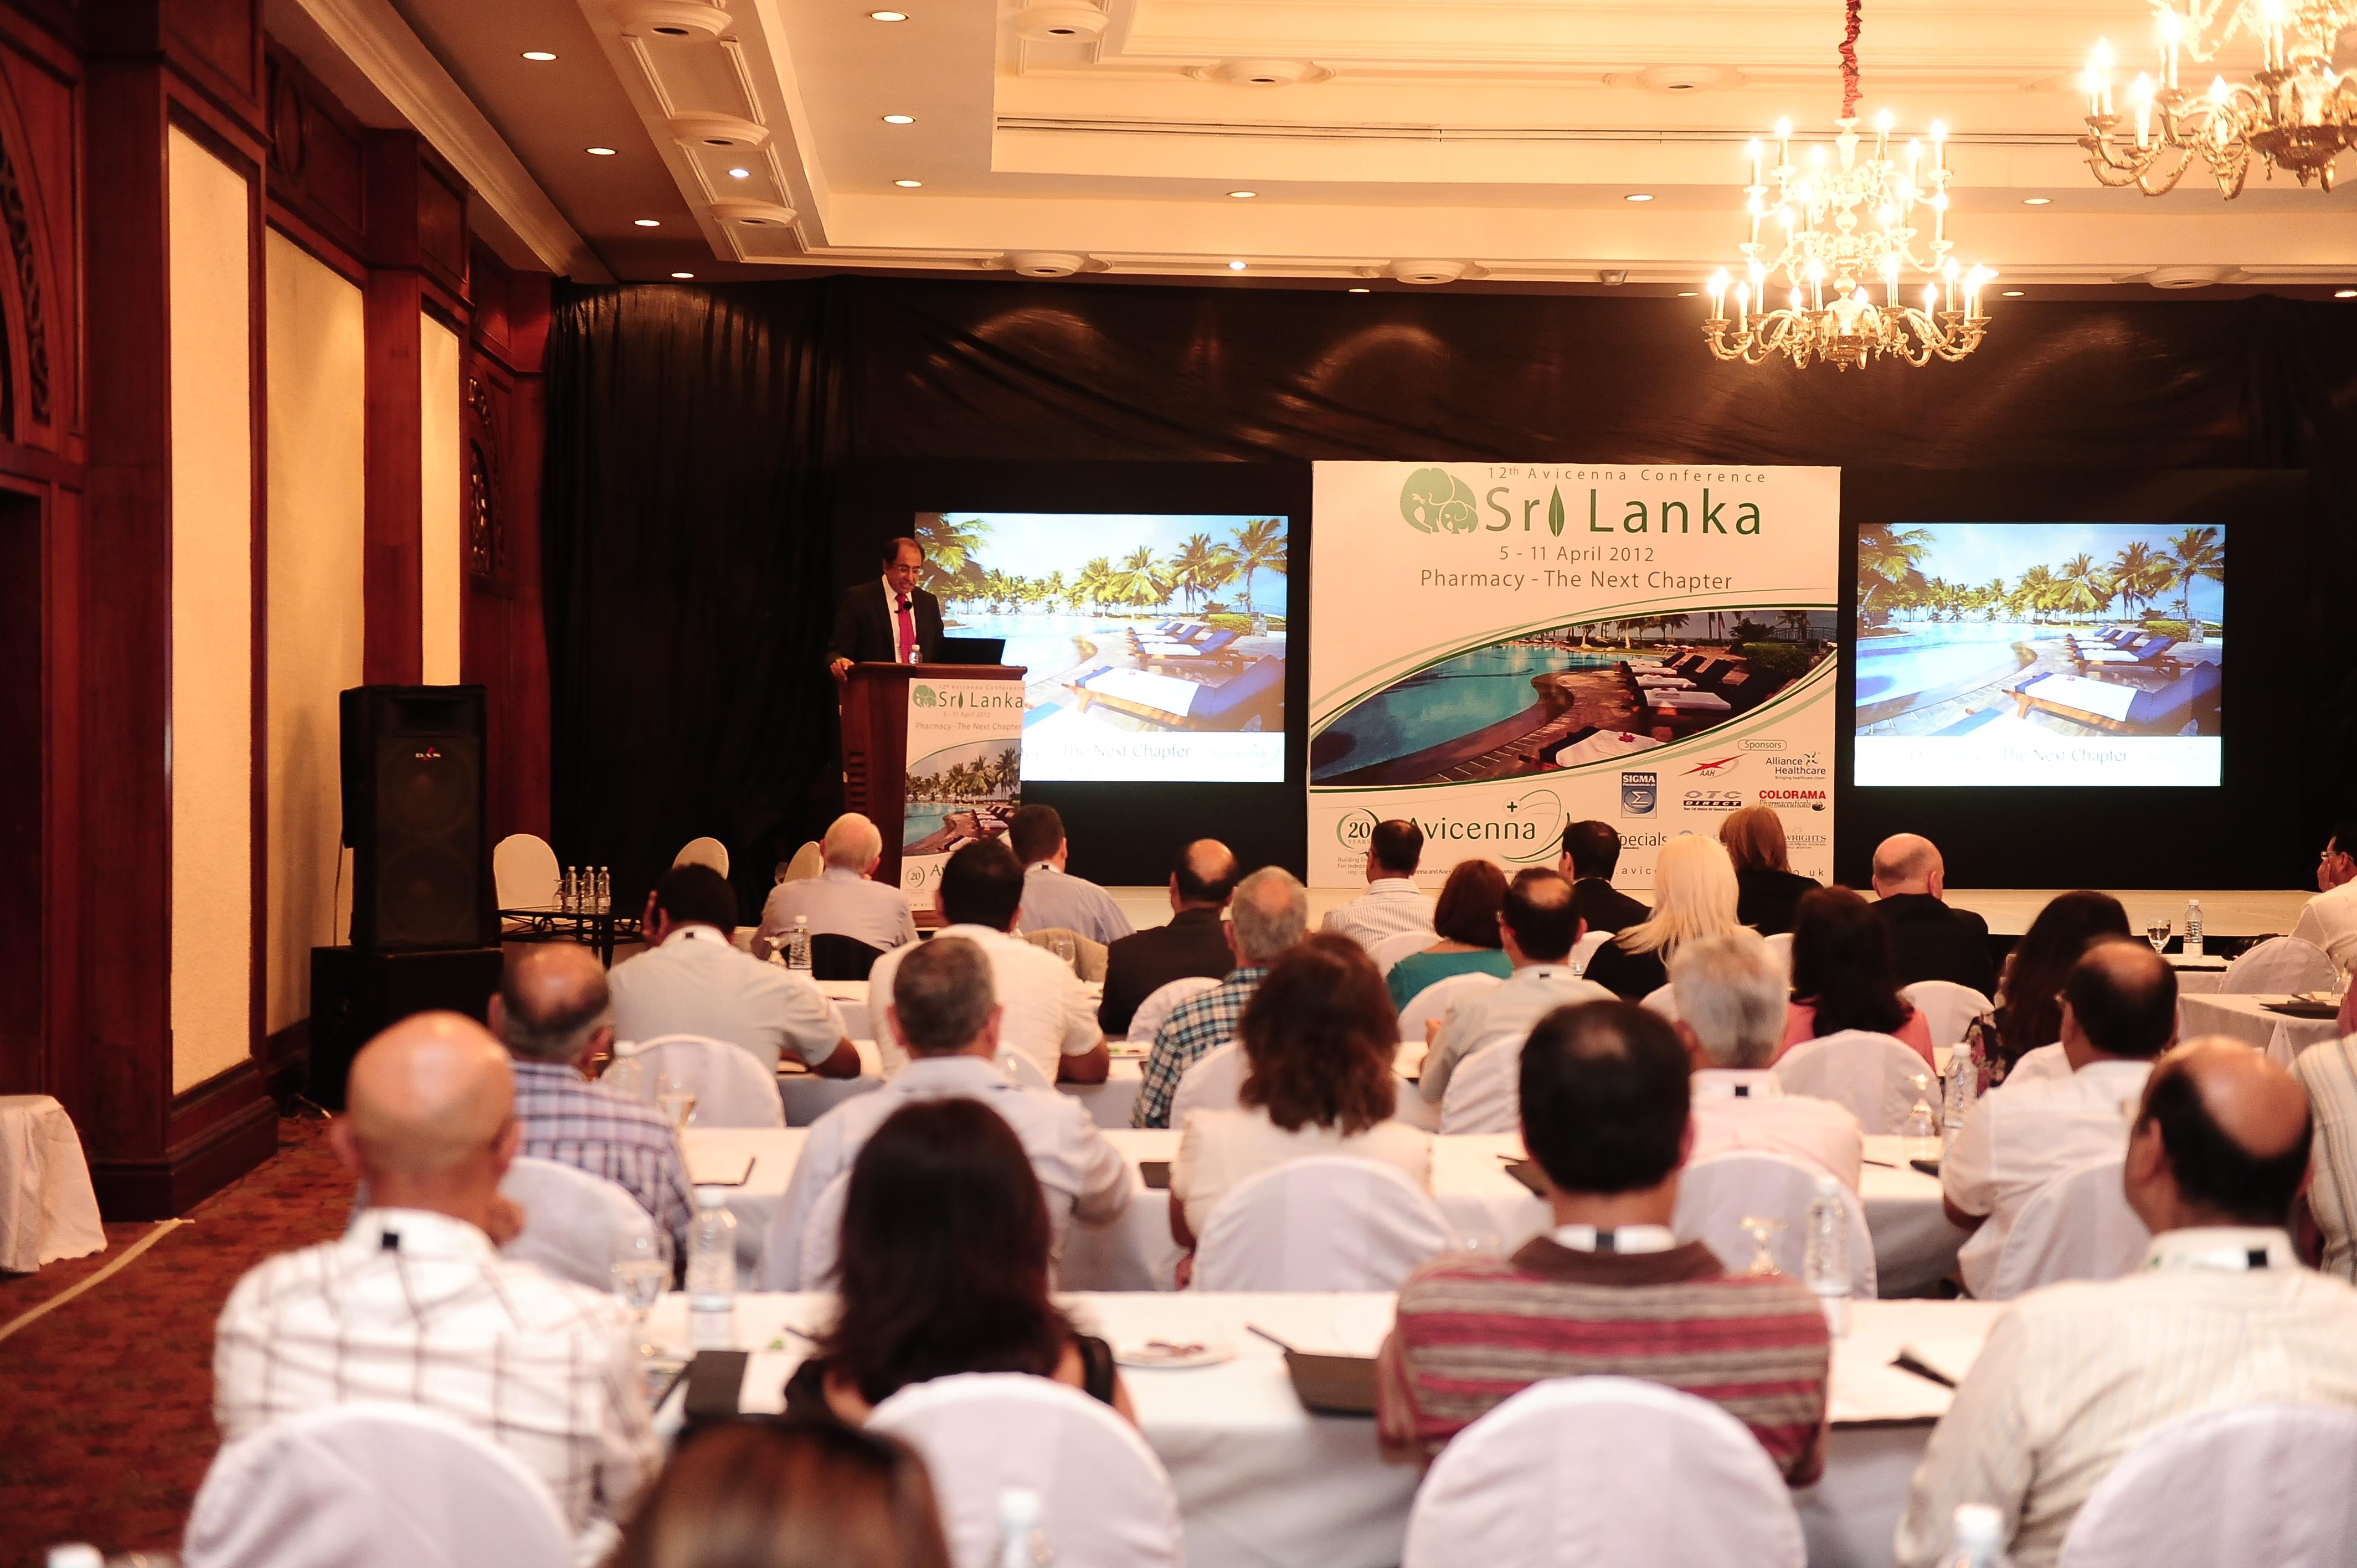 Meetings with MICE.lk, Sri lanka as a MICE destination